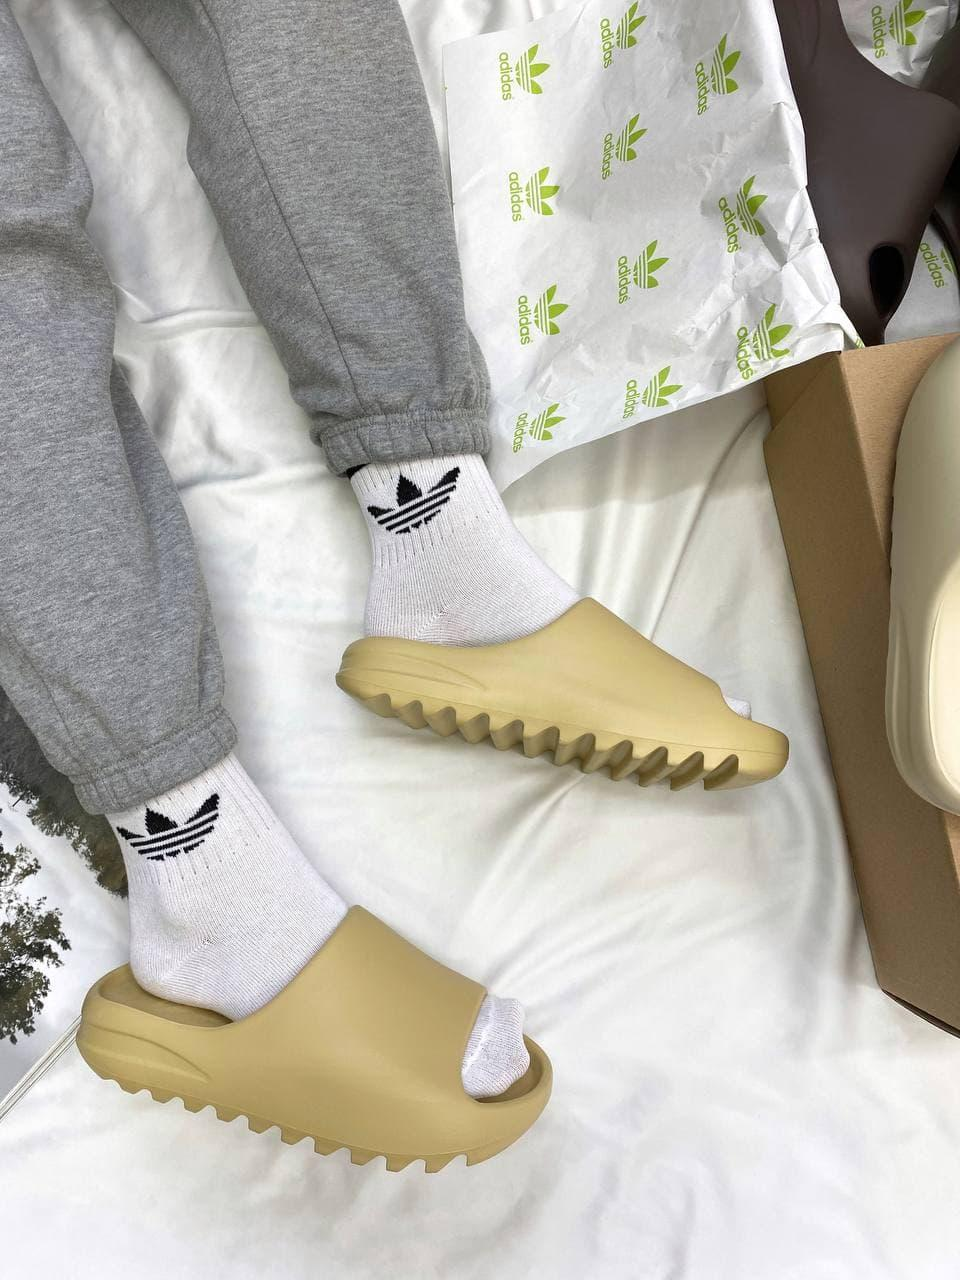 Женские шлепки Adidas Yeezy Slide Earth Bone (желтые) YE022 пляжные крутые тапочки